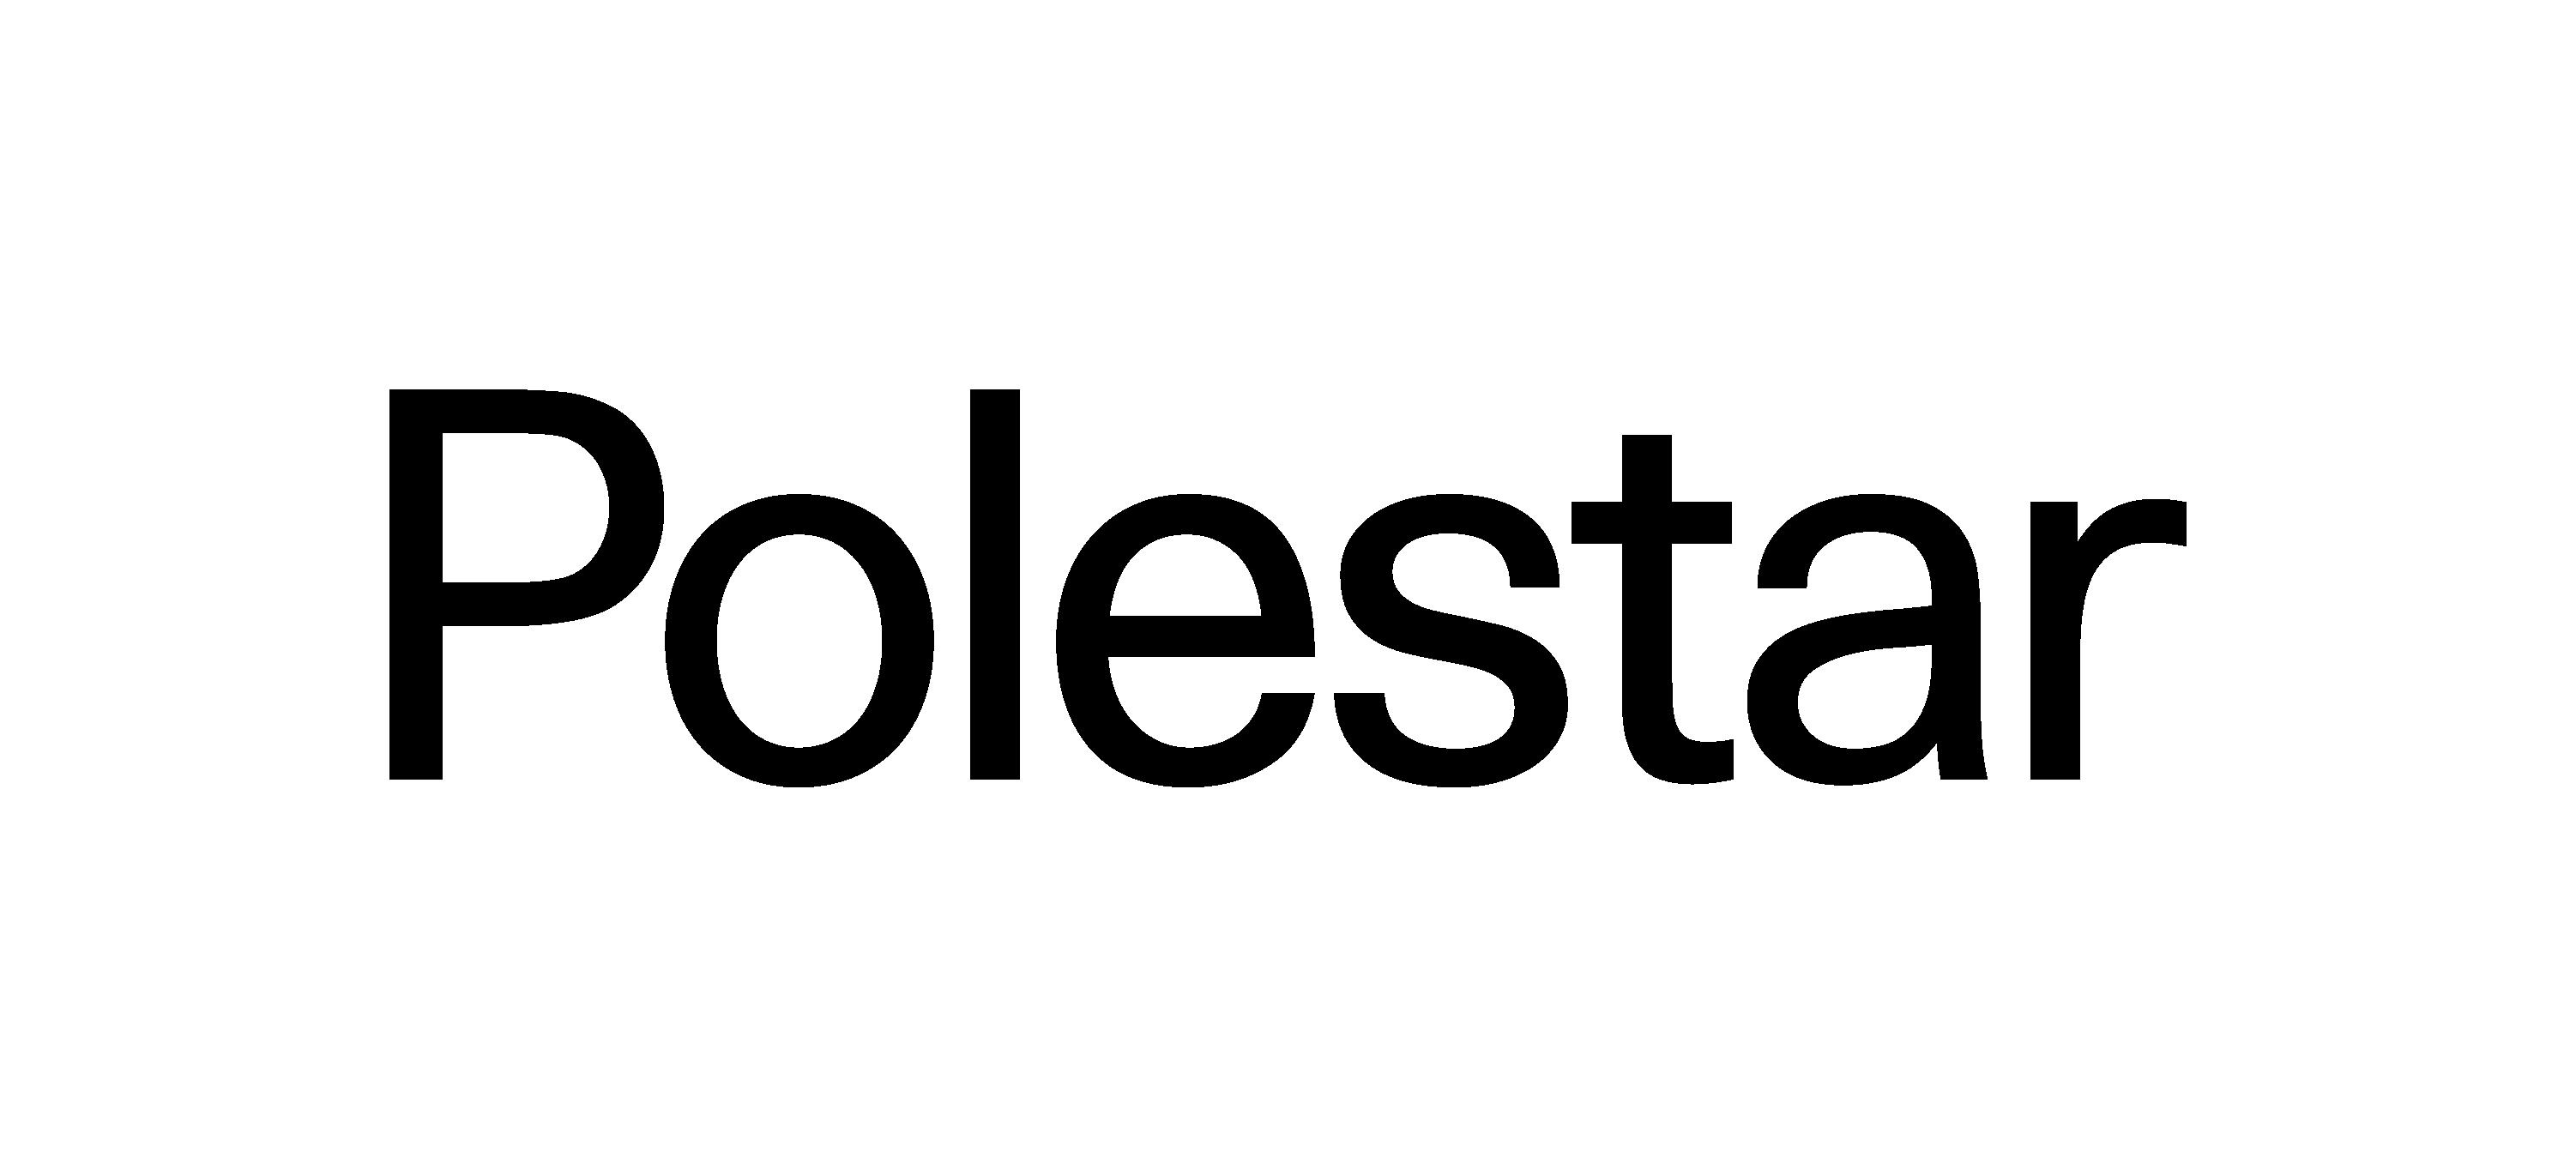 Polestar 2, 100% electric logo